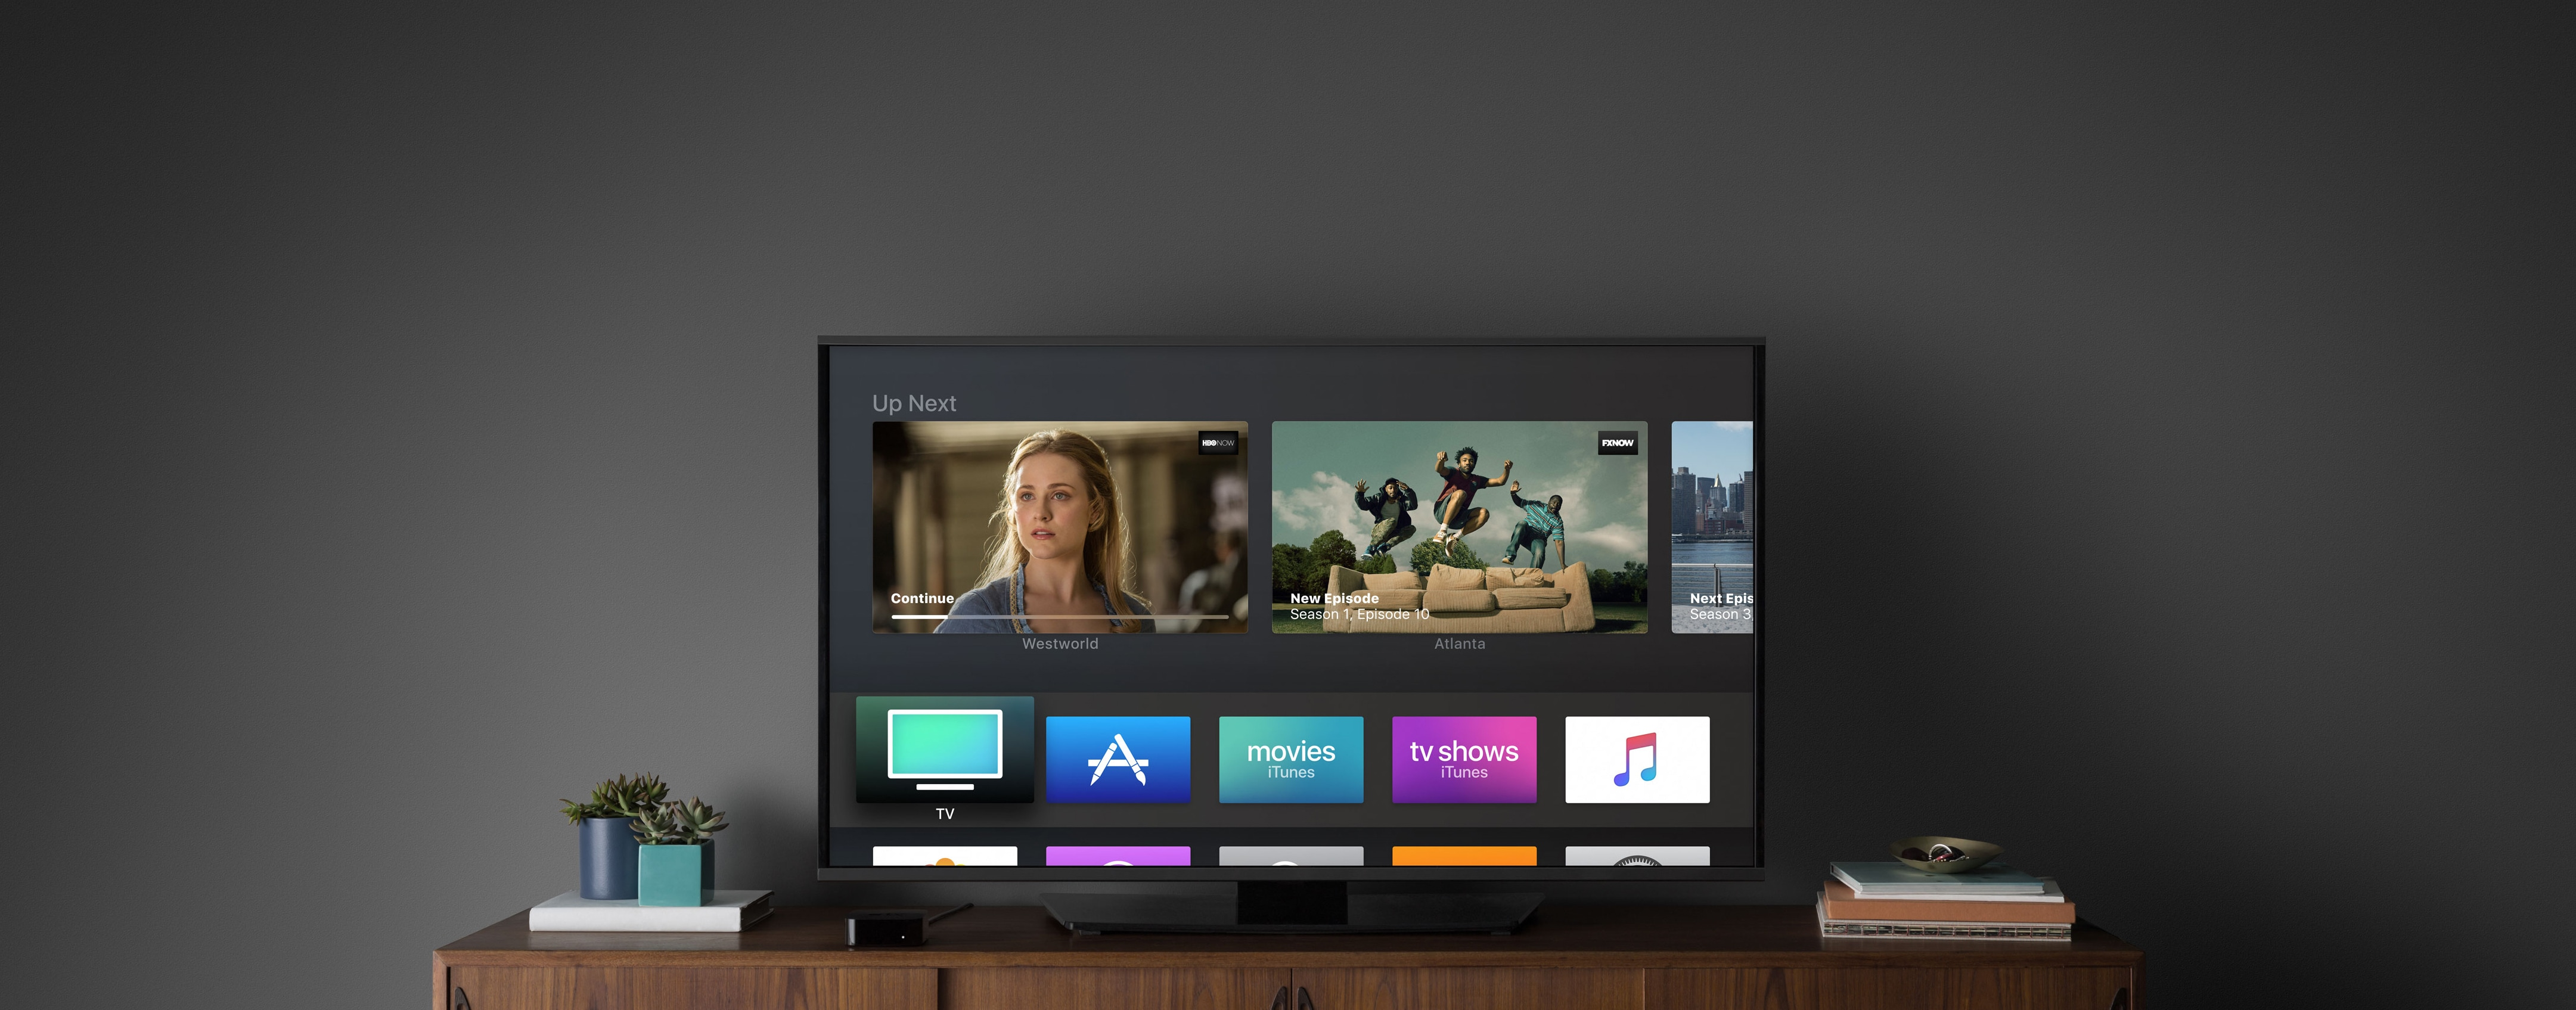 Apple TV com tvOS numa sala